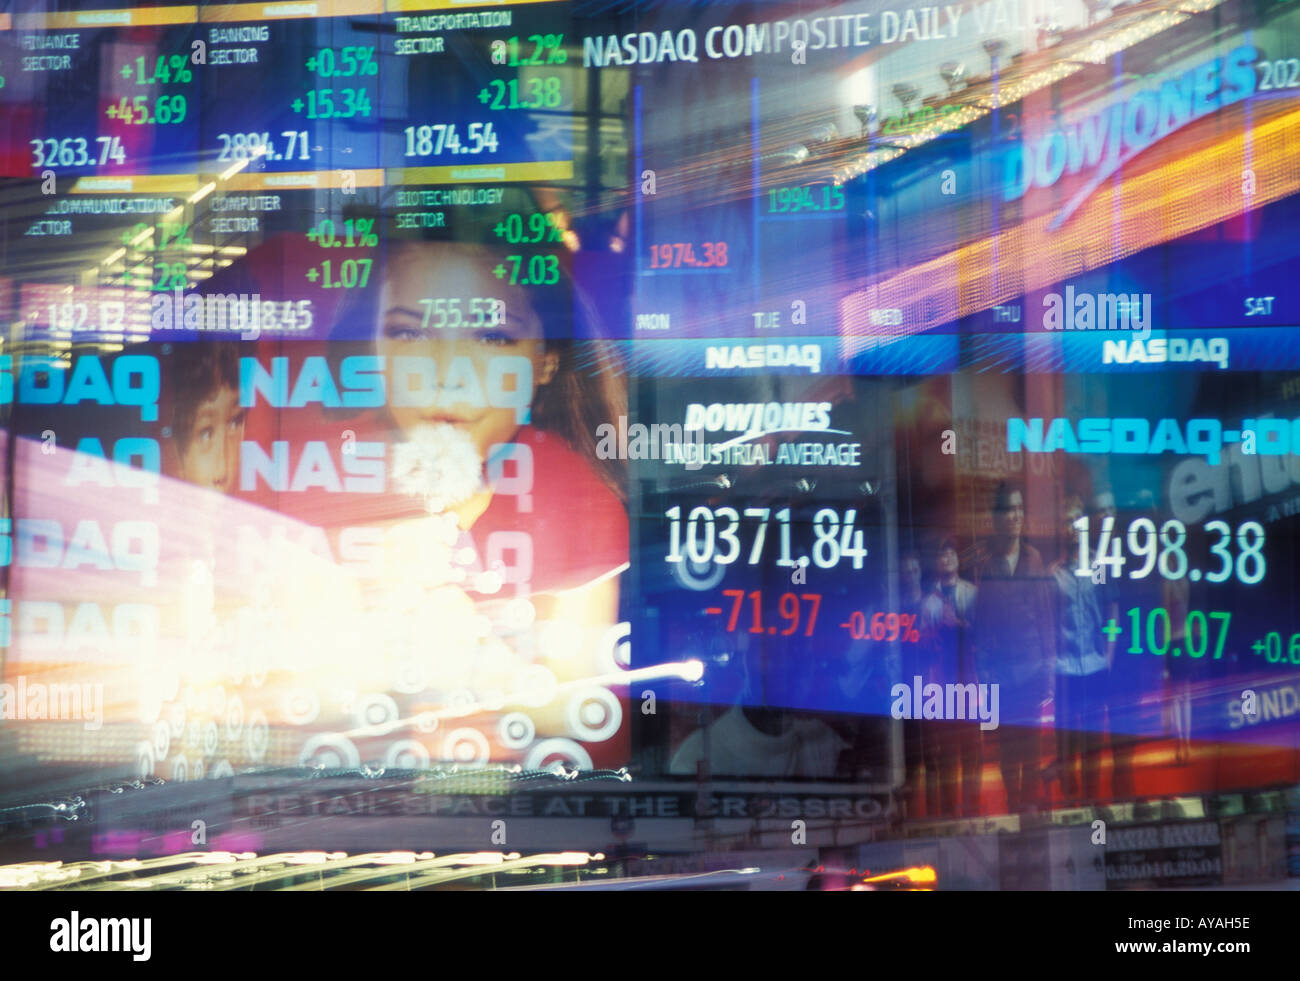 Nasdaq Stock Quotes Nasdaq Stock Quotes Times Square Manhattan New York City United .